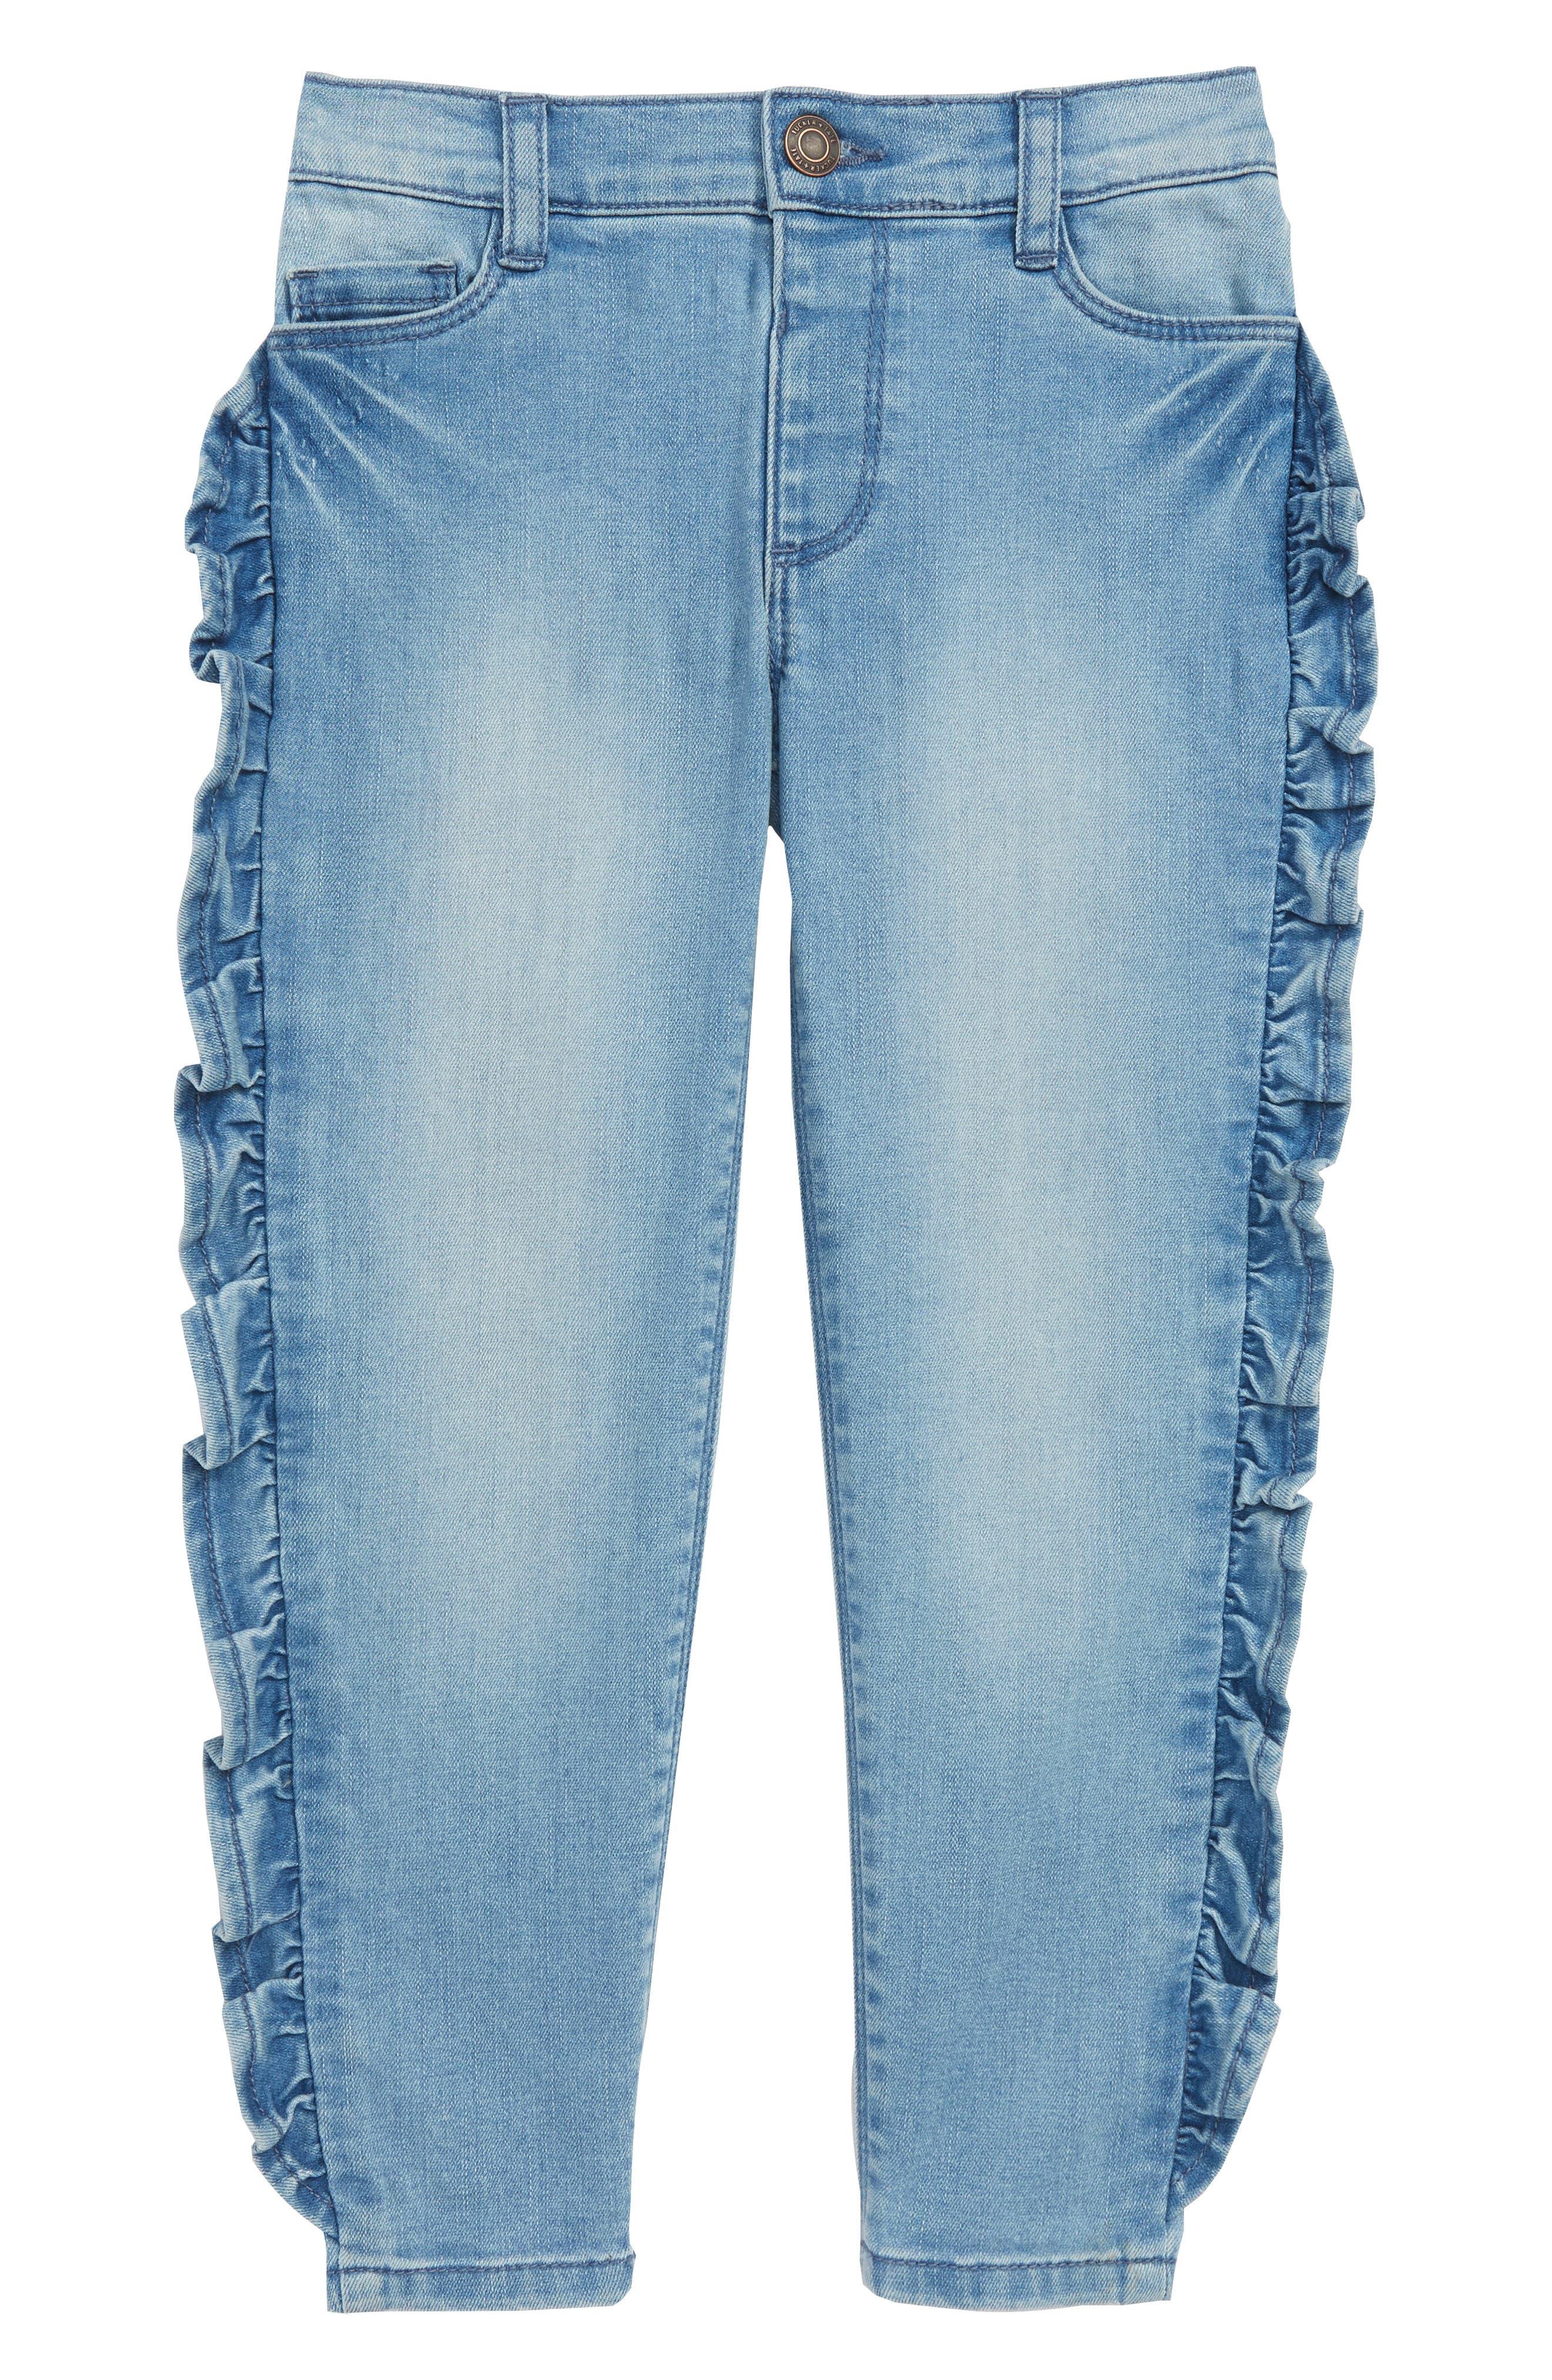 Ruffle Jeans,                             Main thumbnail 1, color,                             RUFFLE SKY WASH